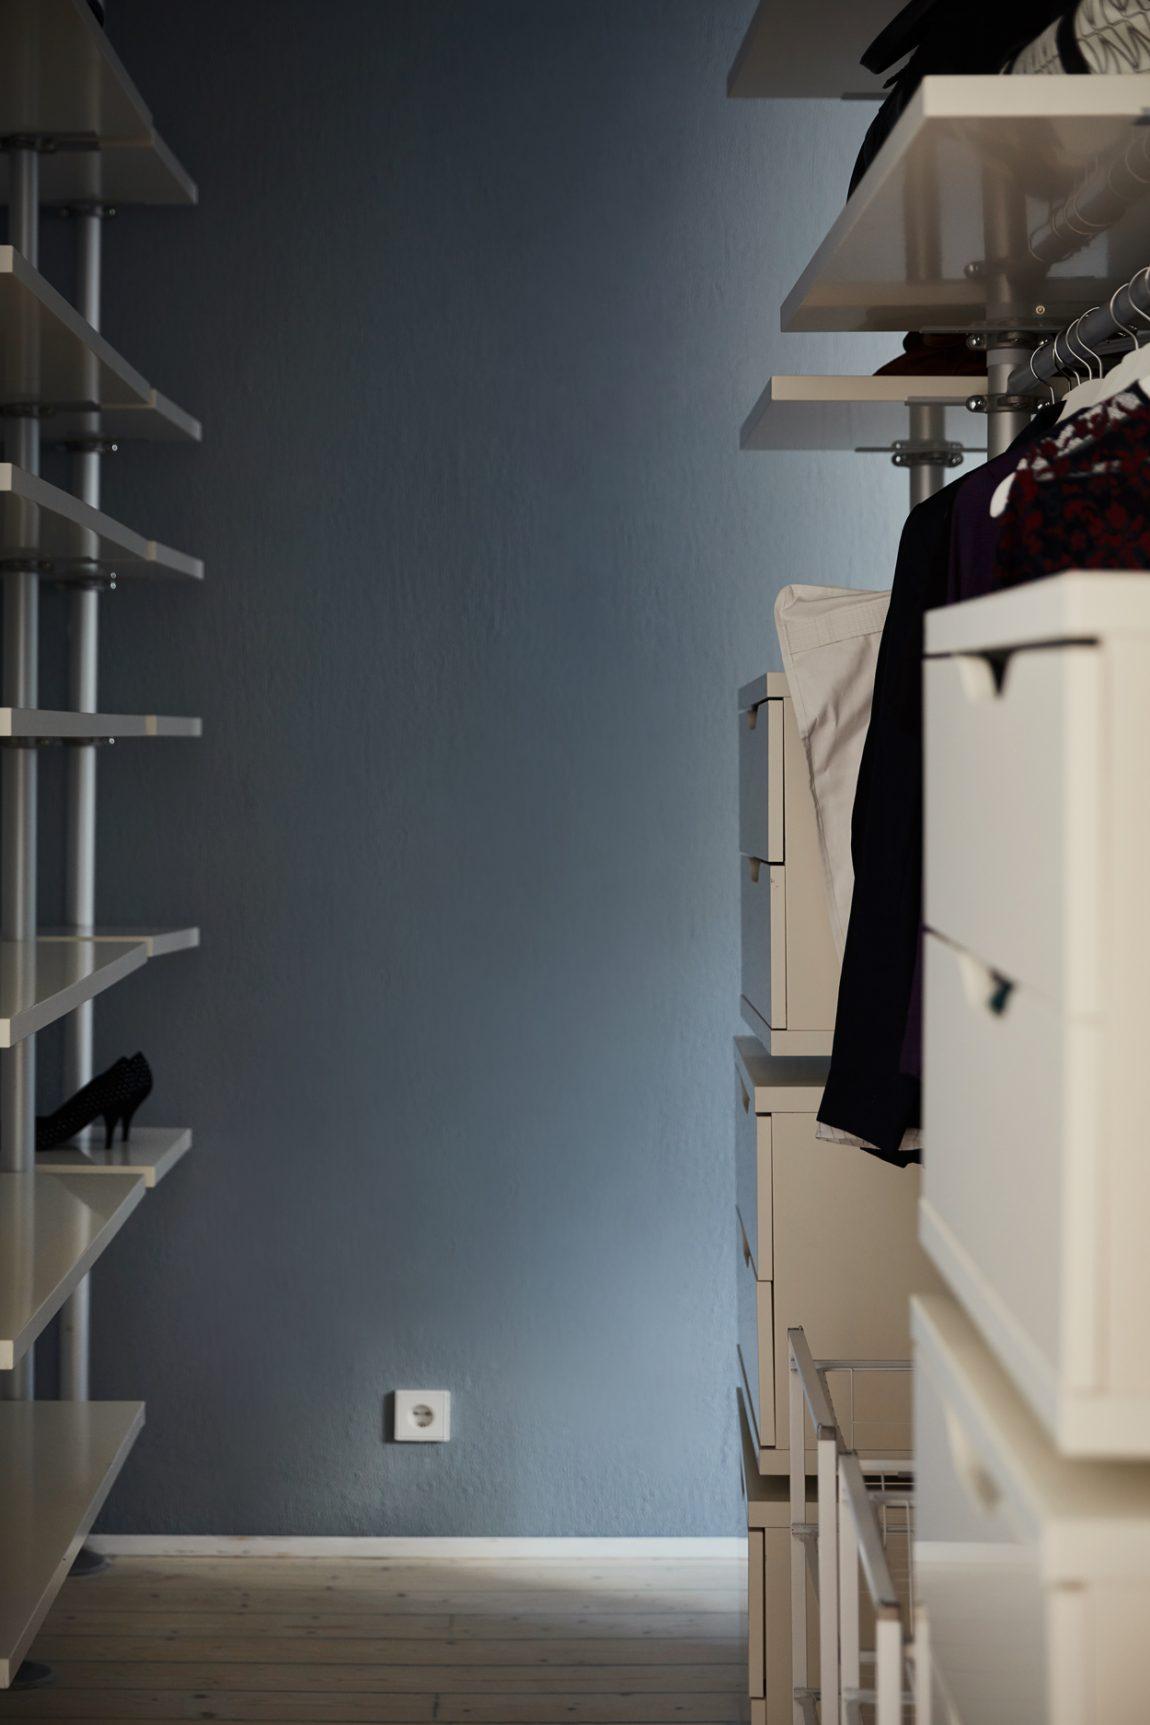 ikea-stolmen-inloopkast-slaapkamer